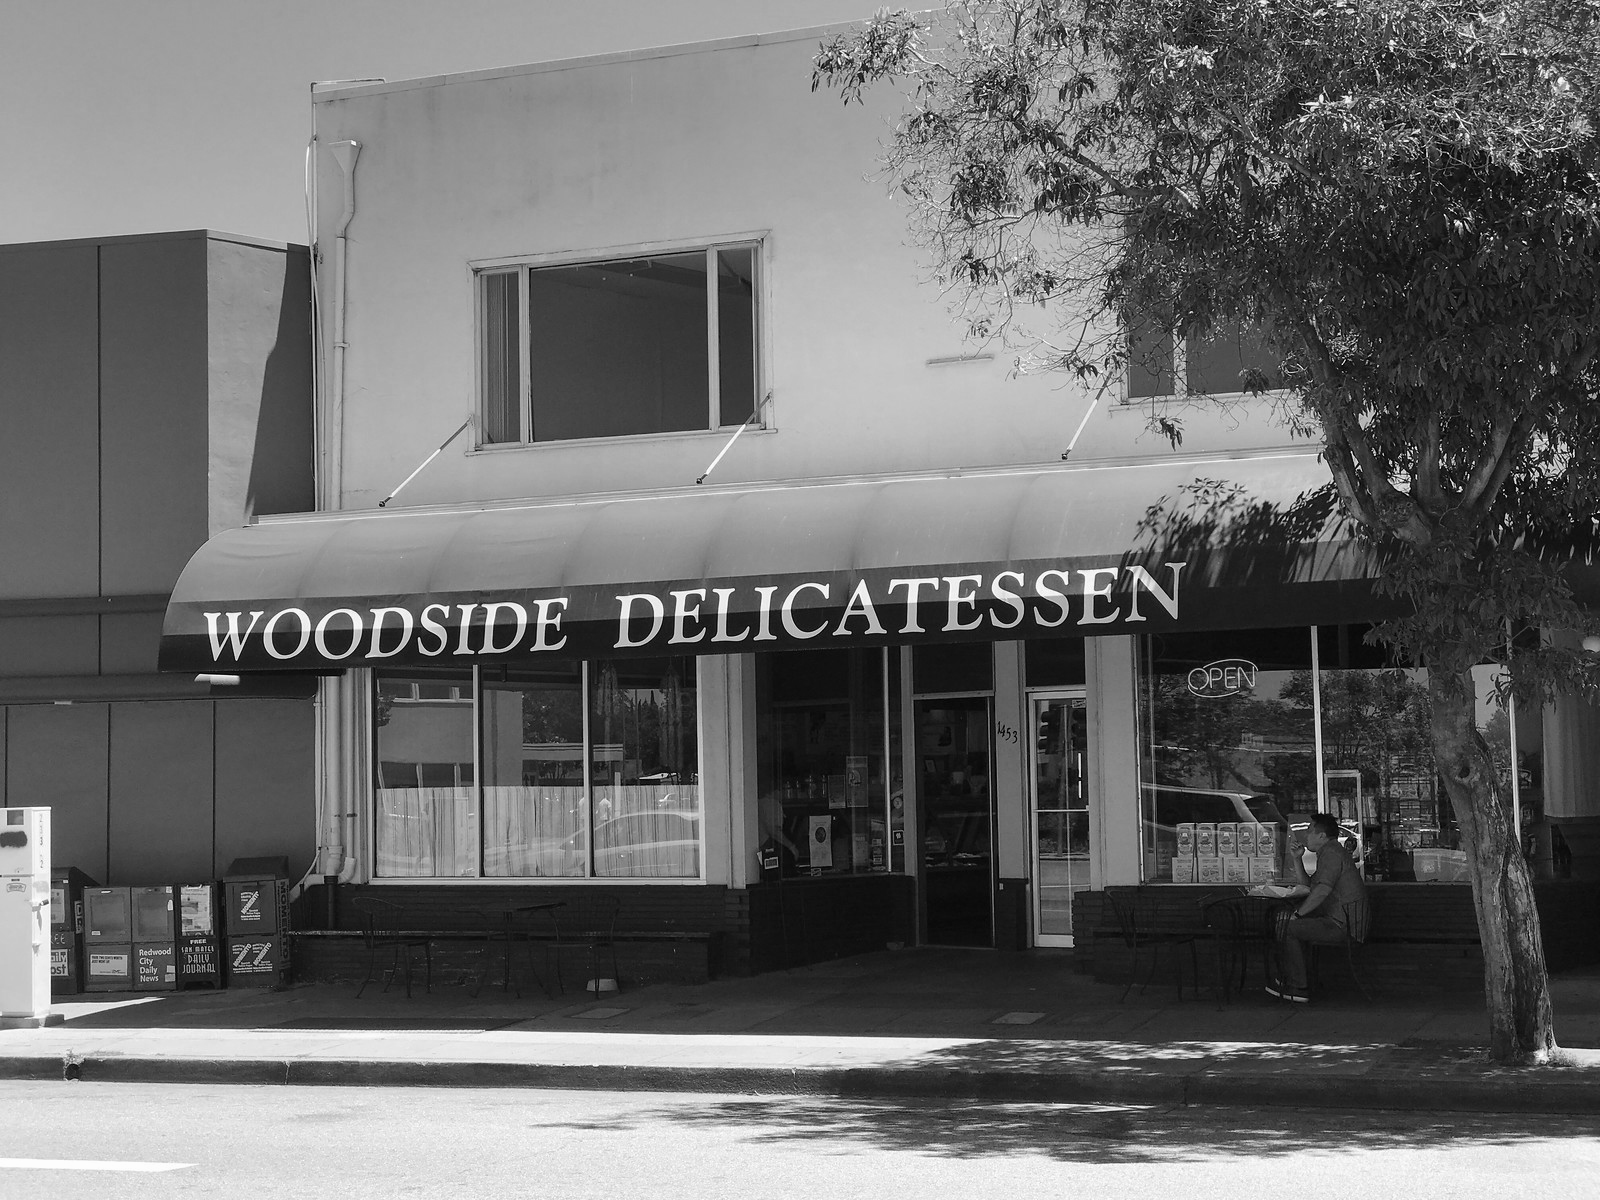 Woodside+Delicatessen+Redwood+City+Blu+Skye+Media+Photographer-X3.jpg